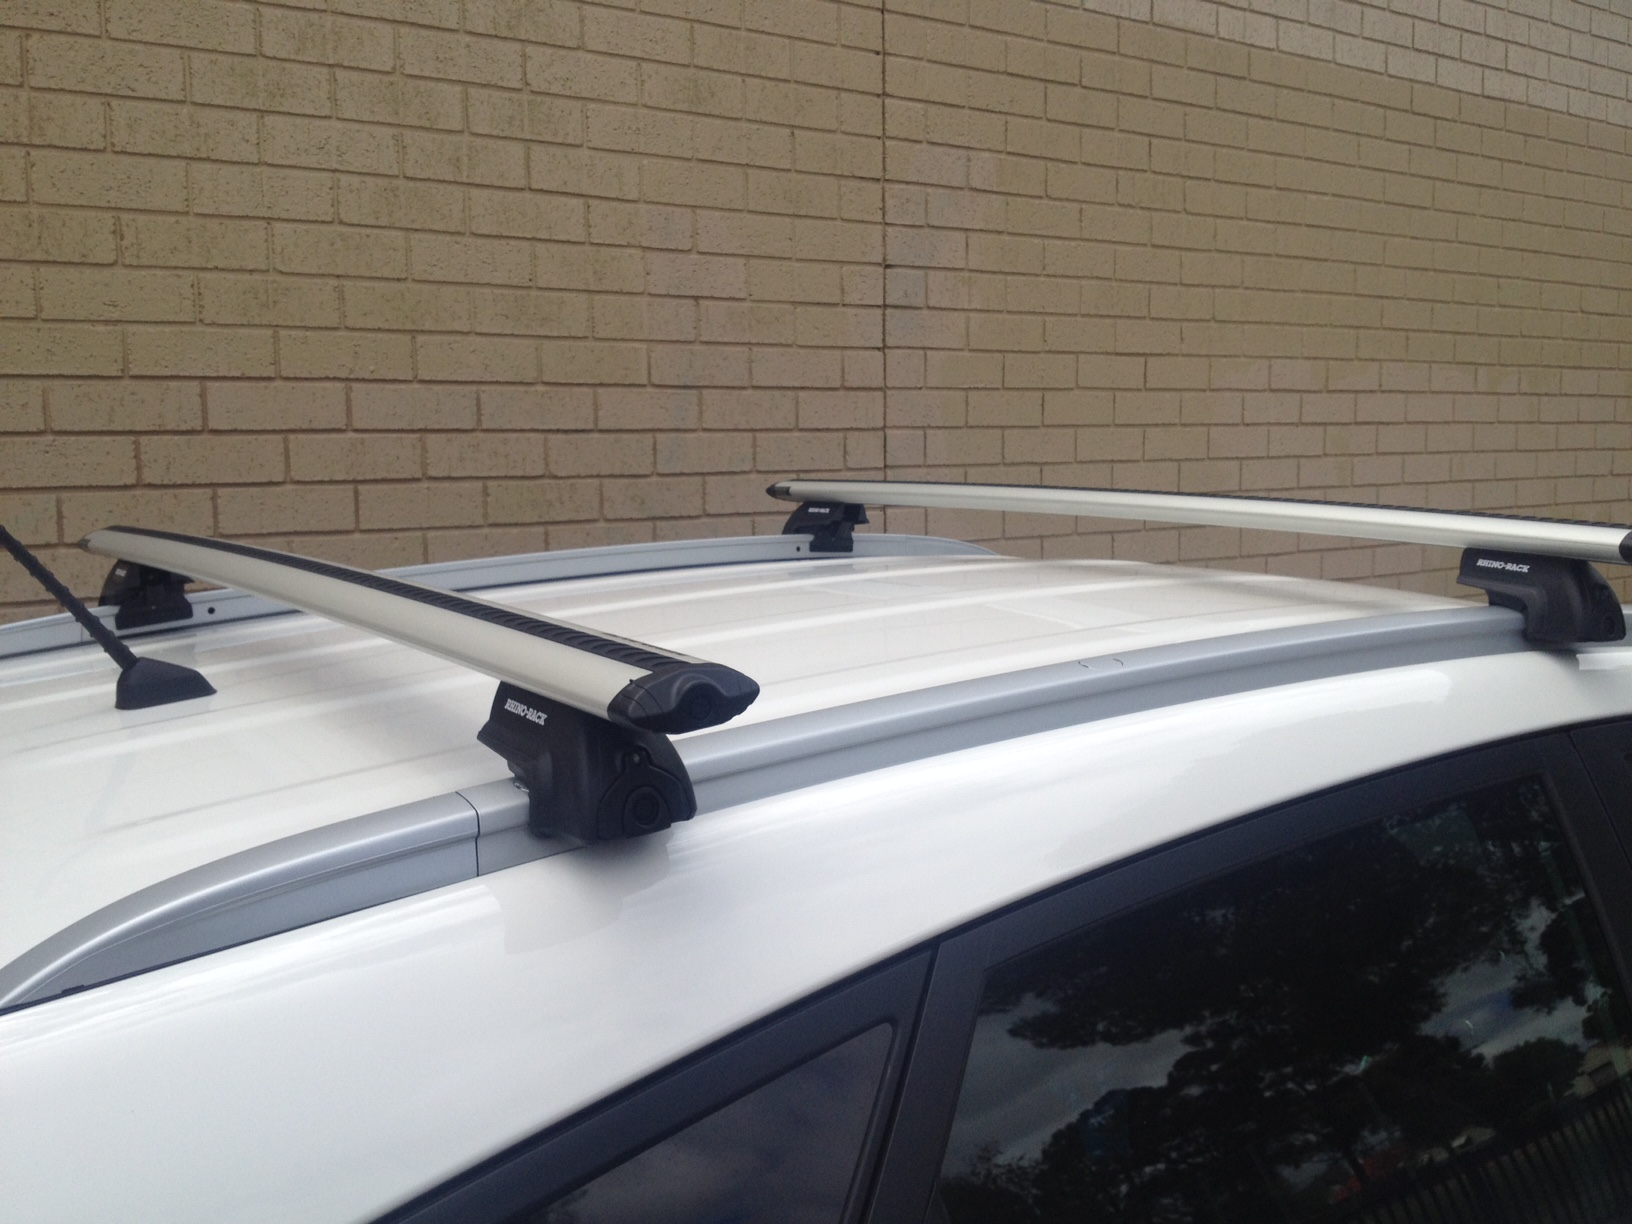 Hyundai I Ix35 4dr Suv With Solid Roof Rails Trophy 01